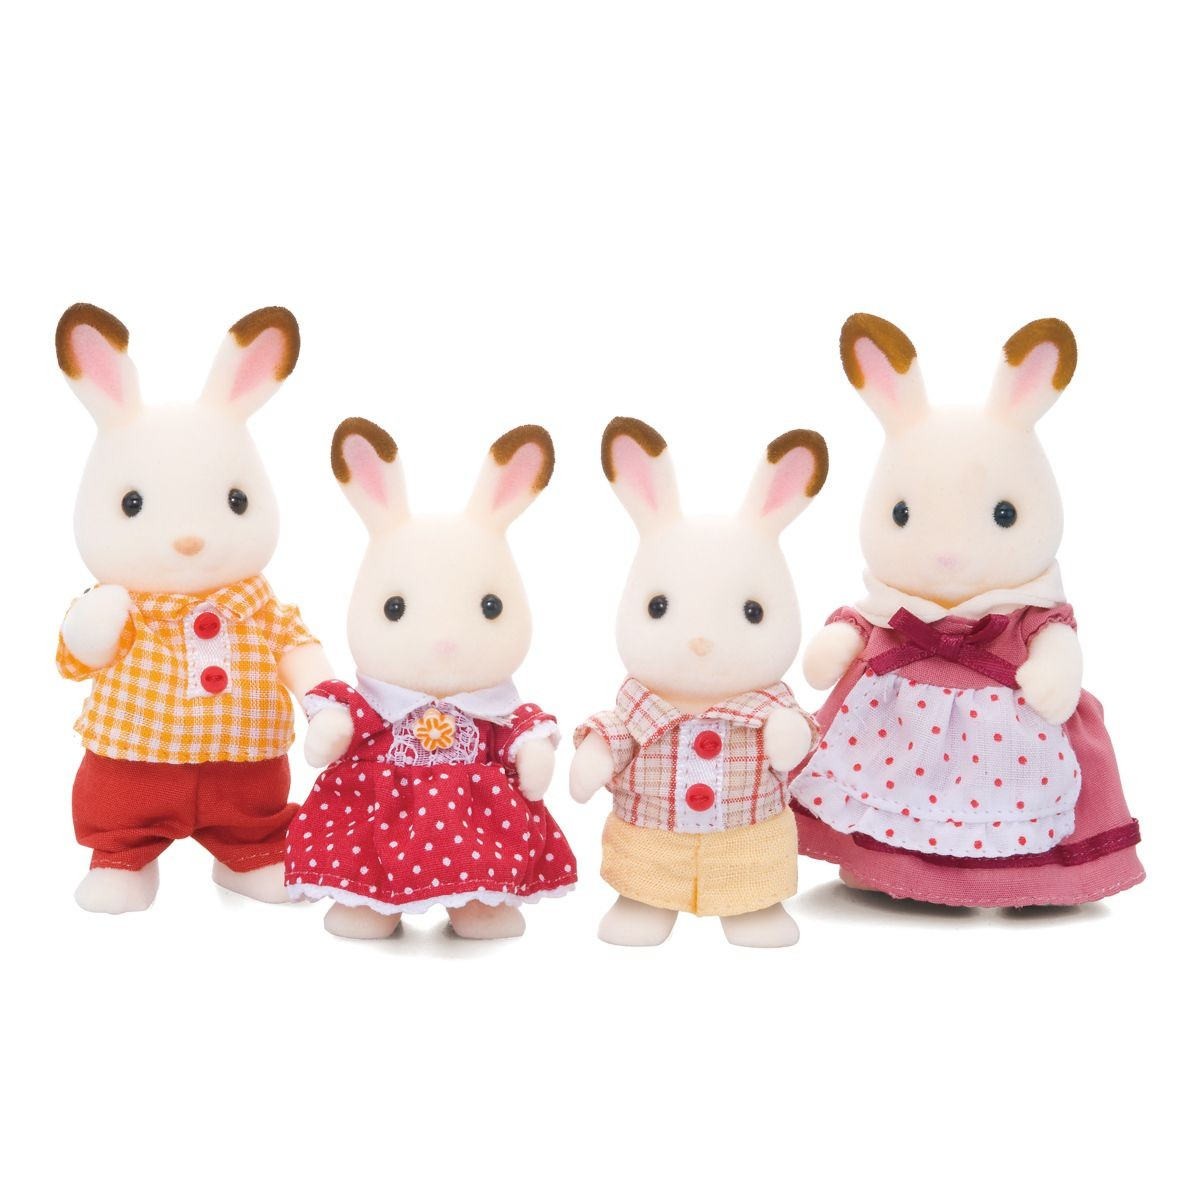 Sylvanian Families - Chocolate Rabbit Familiy (4150)